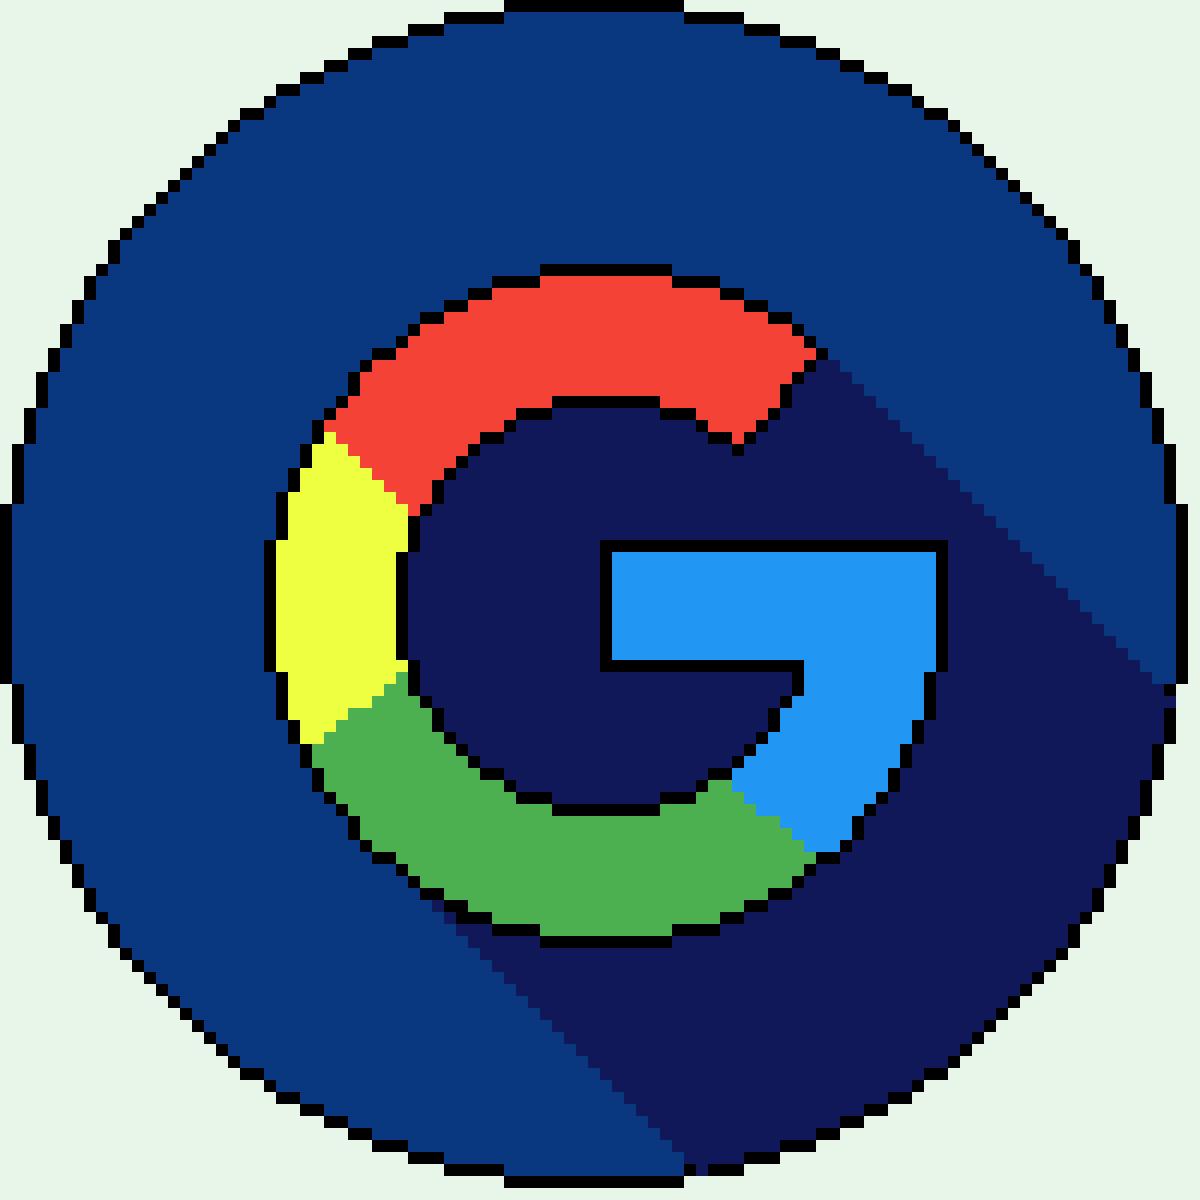 google logo by derpy-41